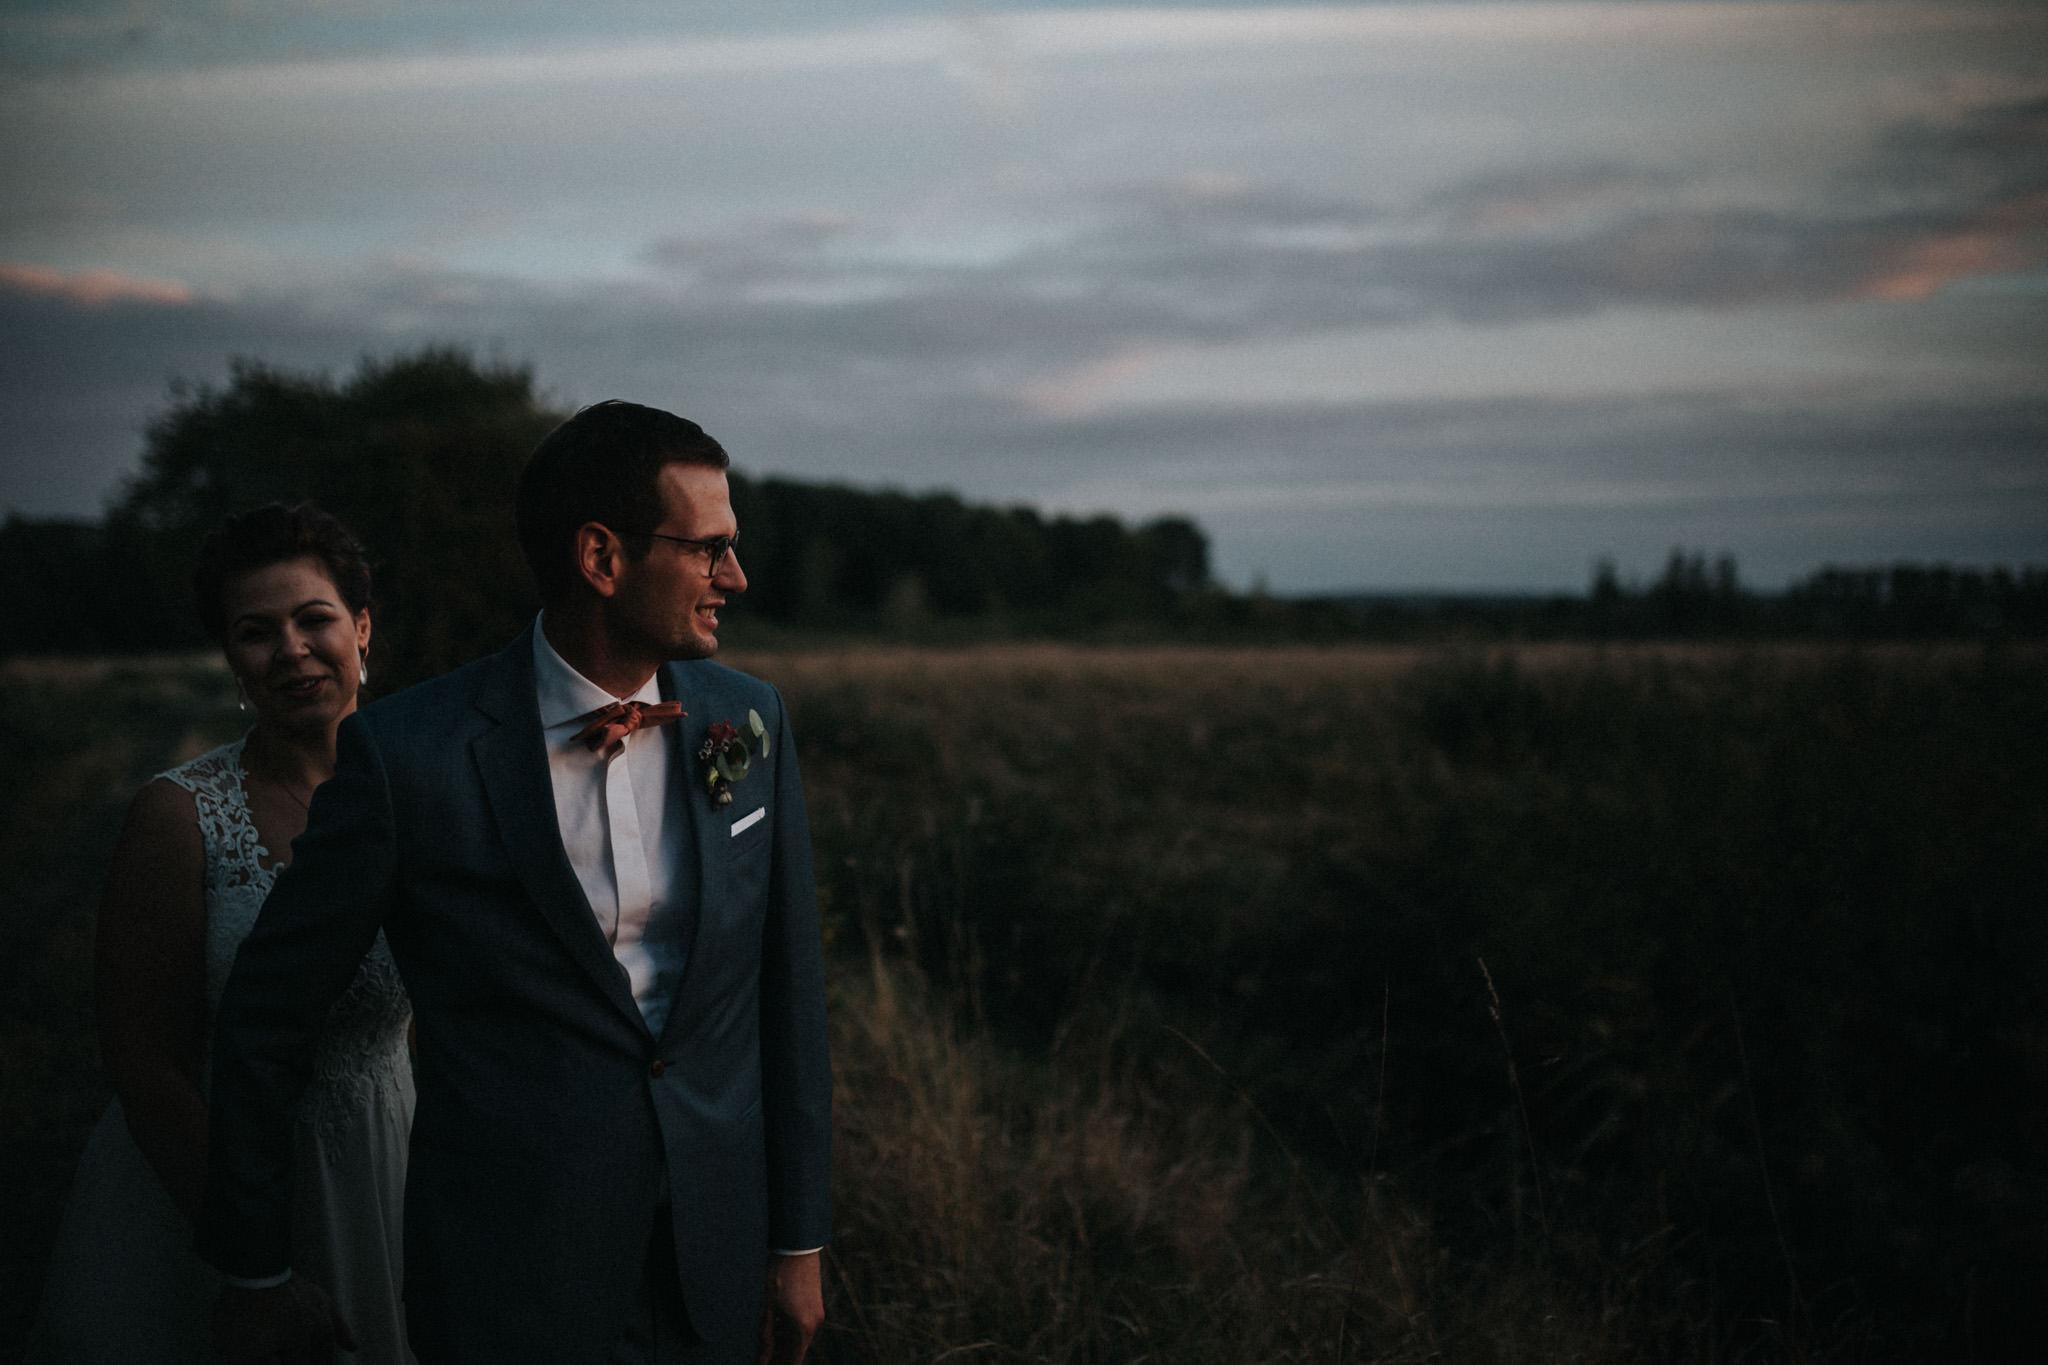 Hochzeitsfotograf-Homberg-61.jpg